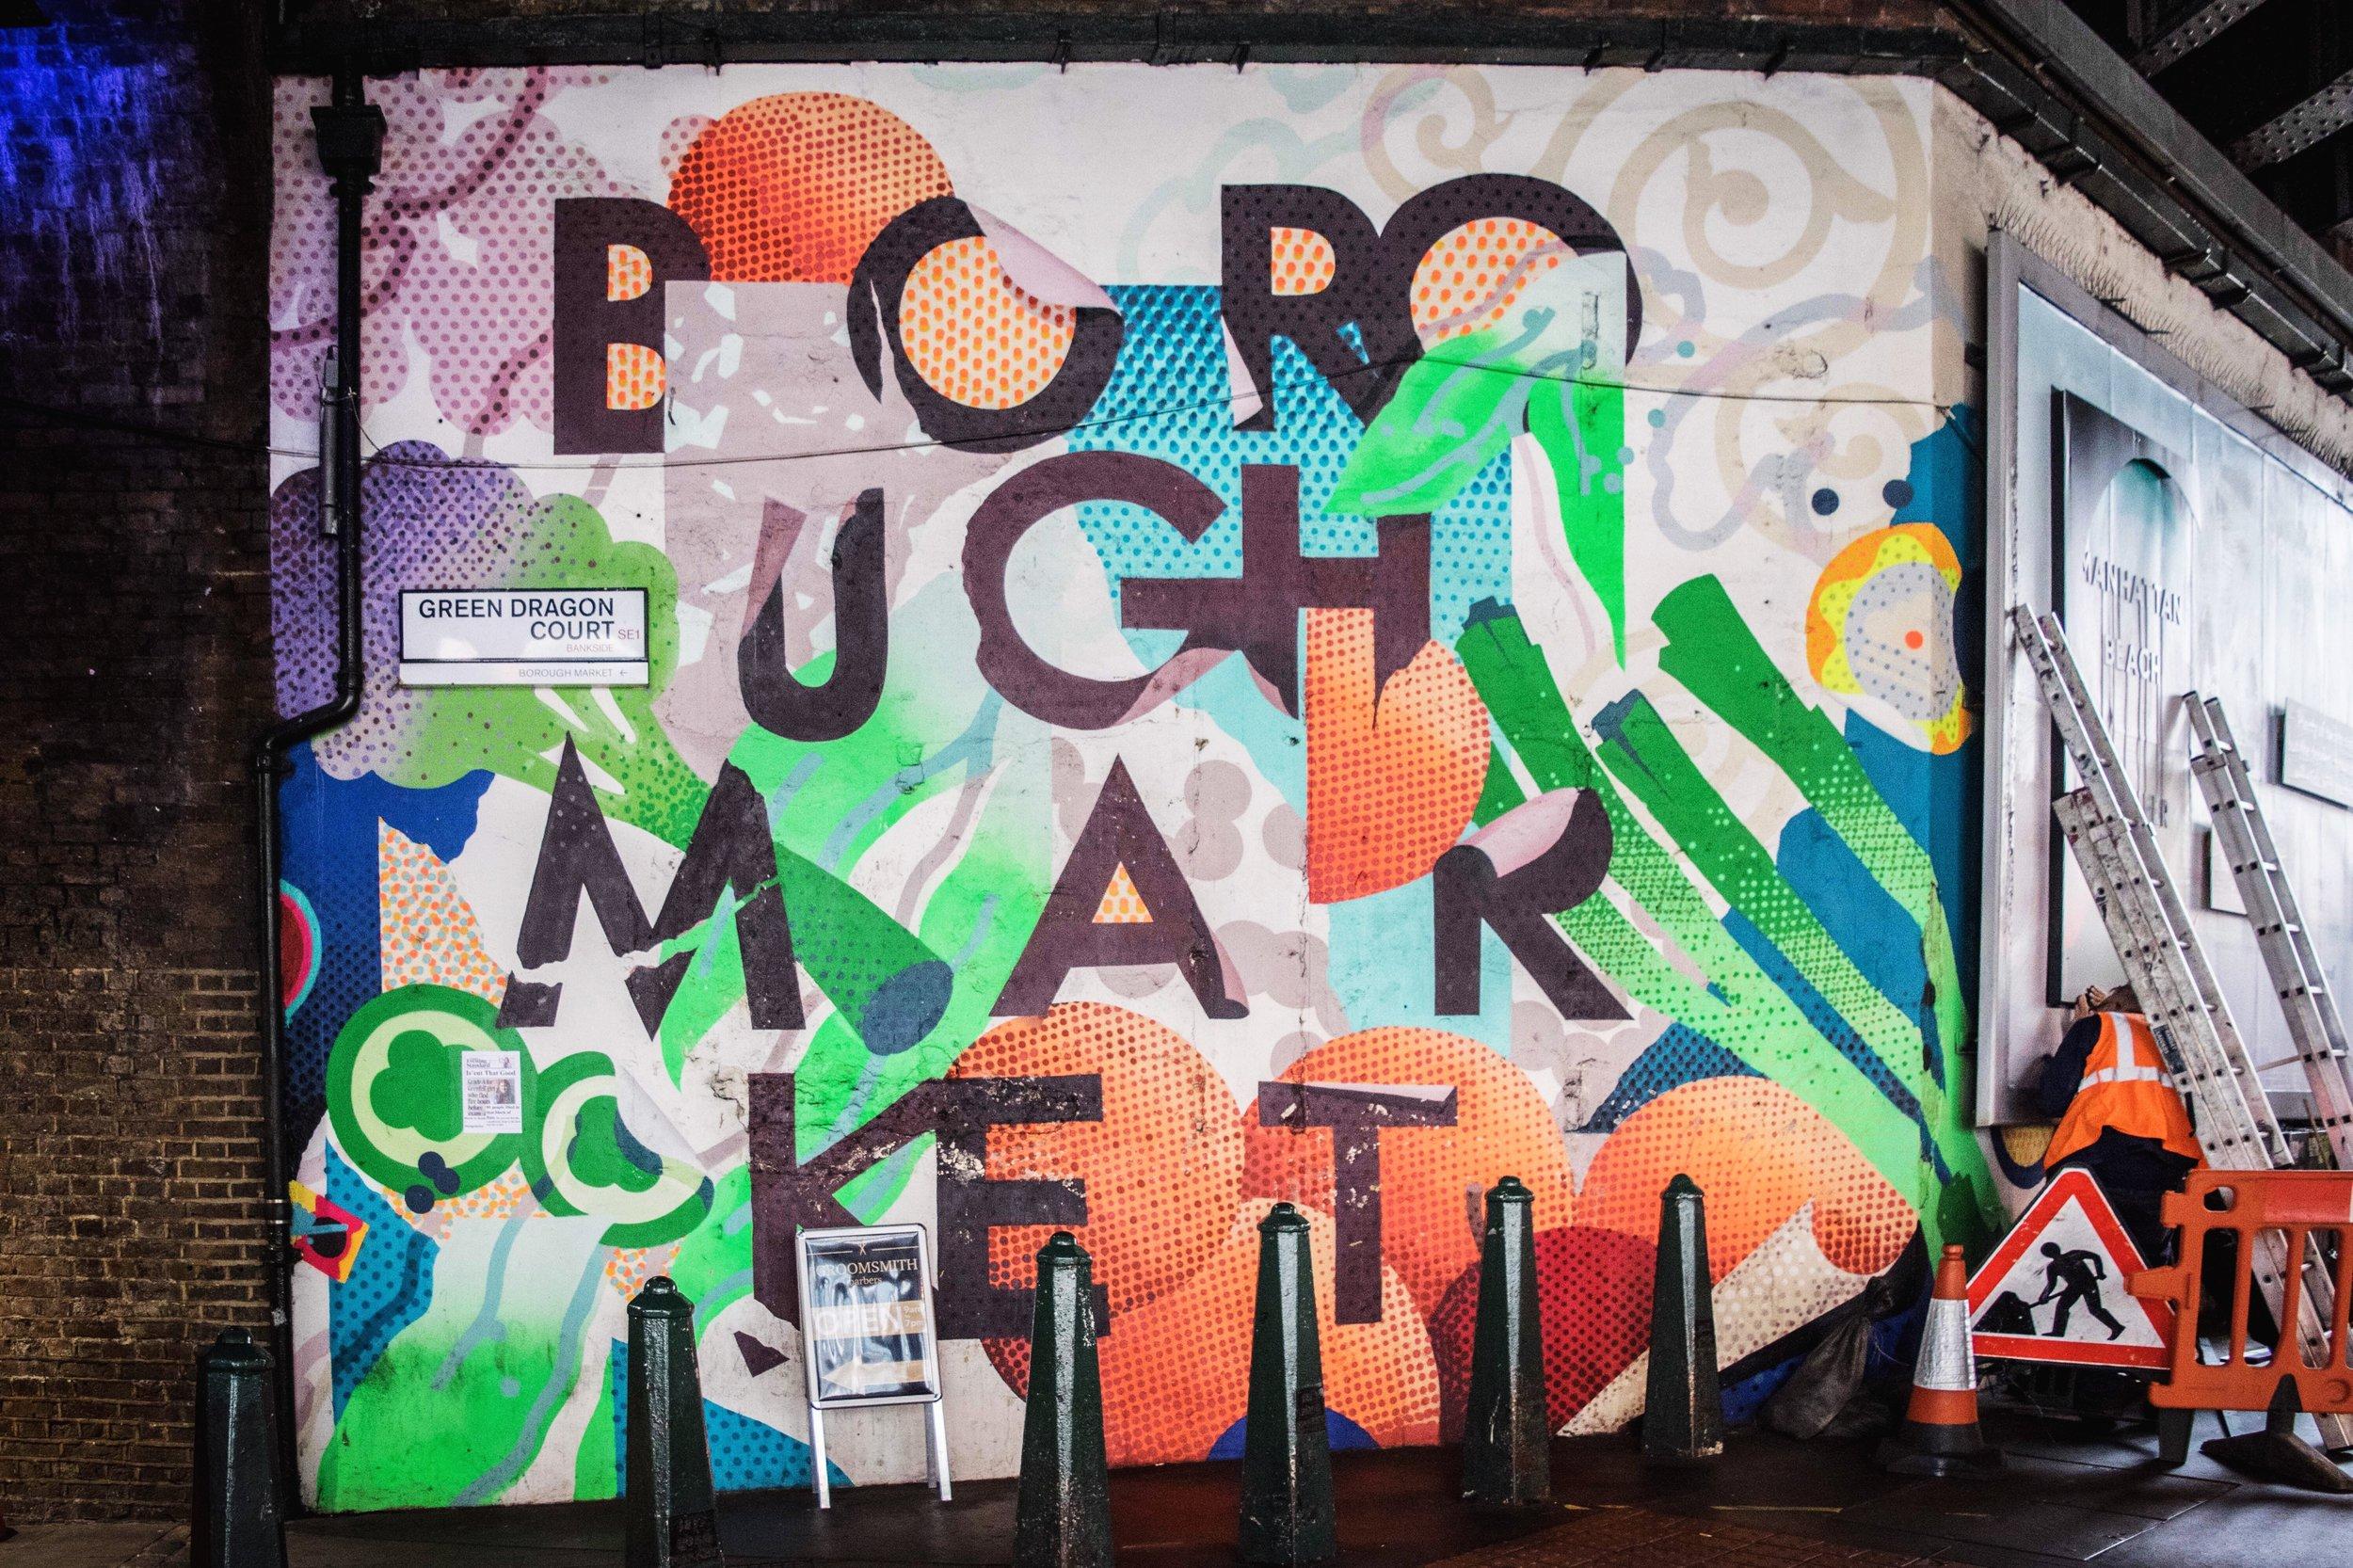 Colorful Borough Market sign